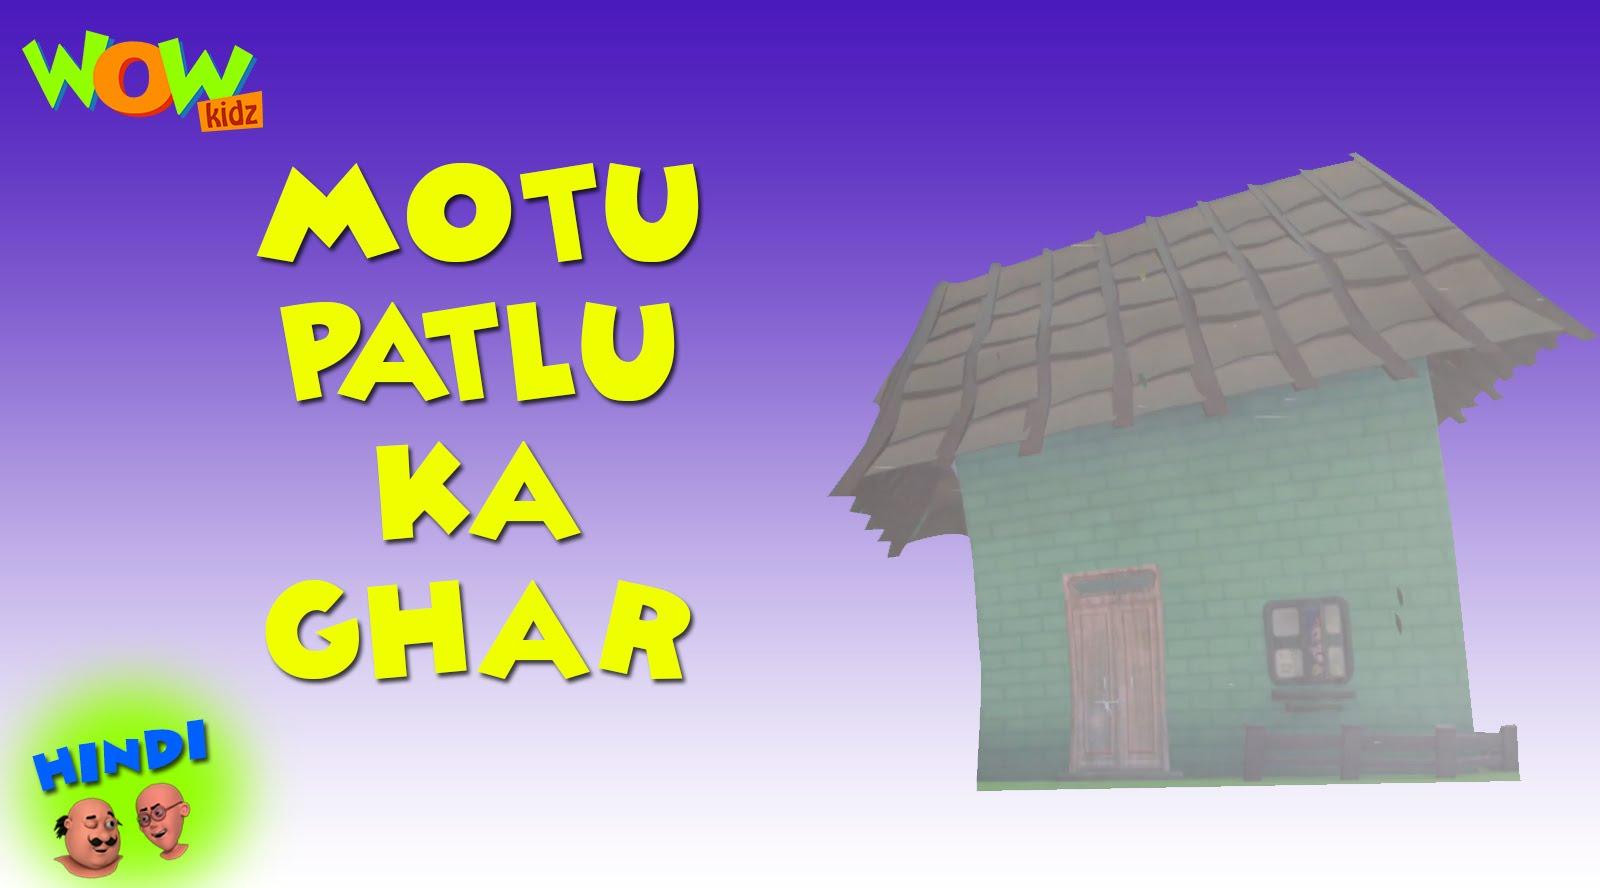 Motu Patlu S Home Motu Patlu Wiki Fandom Powered By Wikia